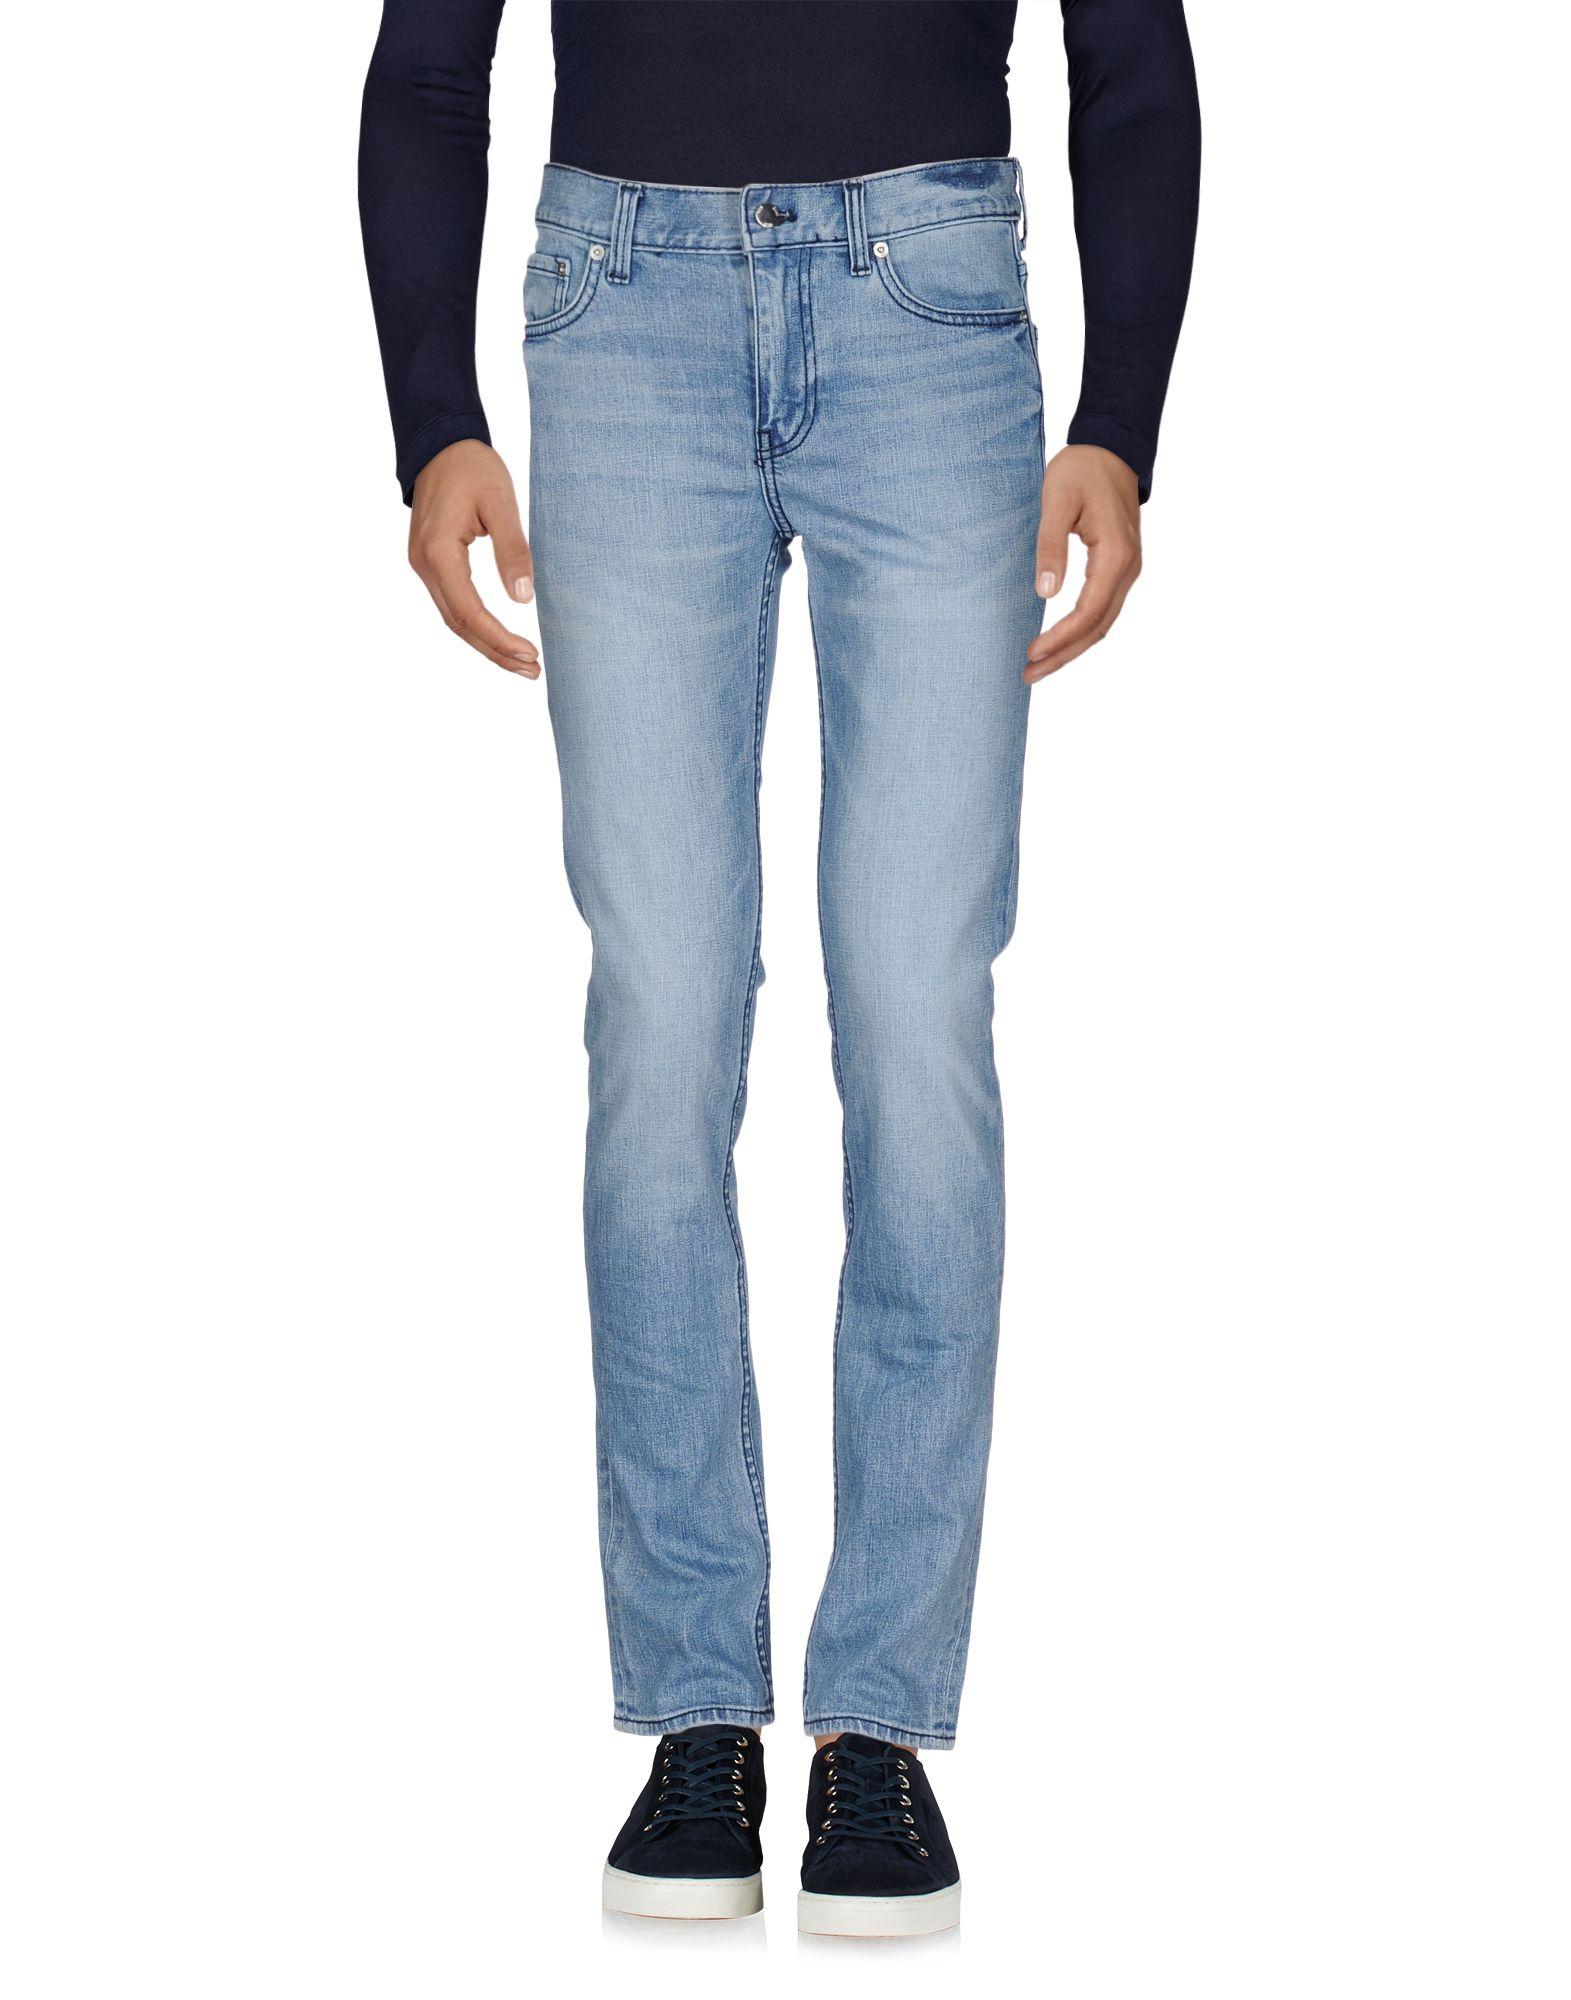 BLK DNM Denim Pants in Blue